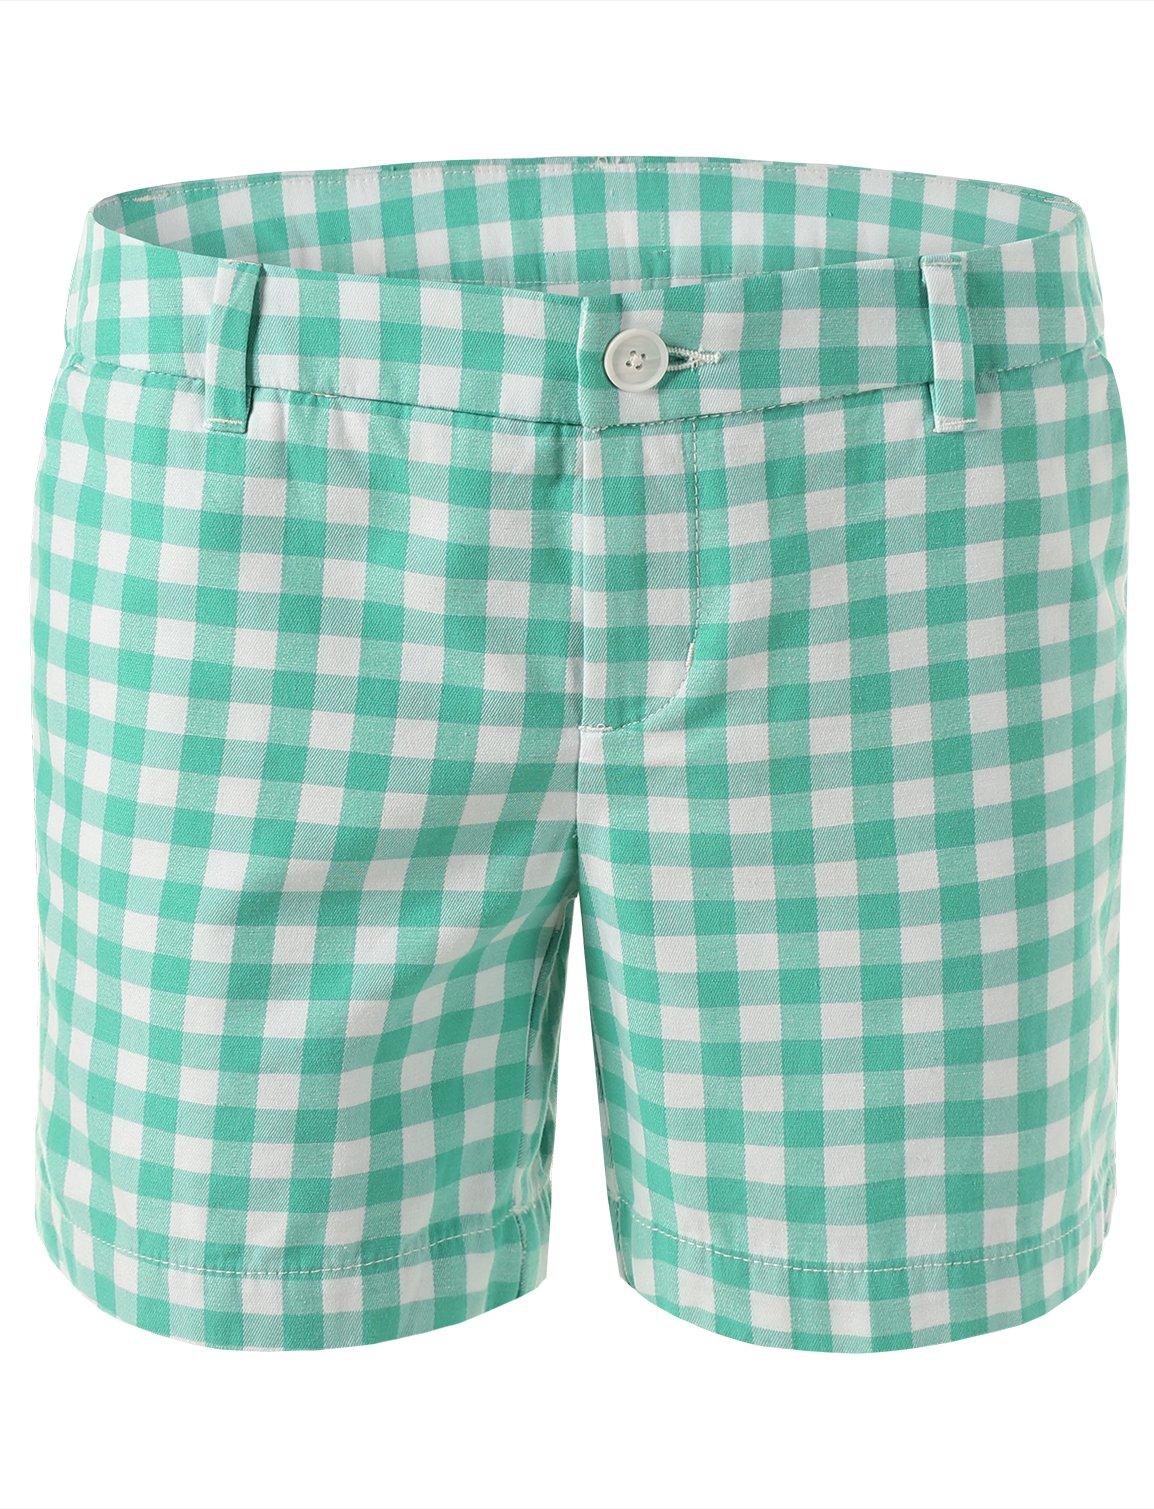 7 Encounter Women's Low Rise Casual Stretch Cotton Chino 5'' Shorts (8, Tumble Green)